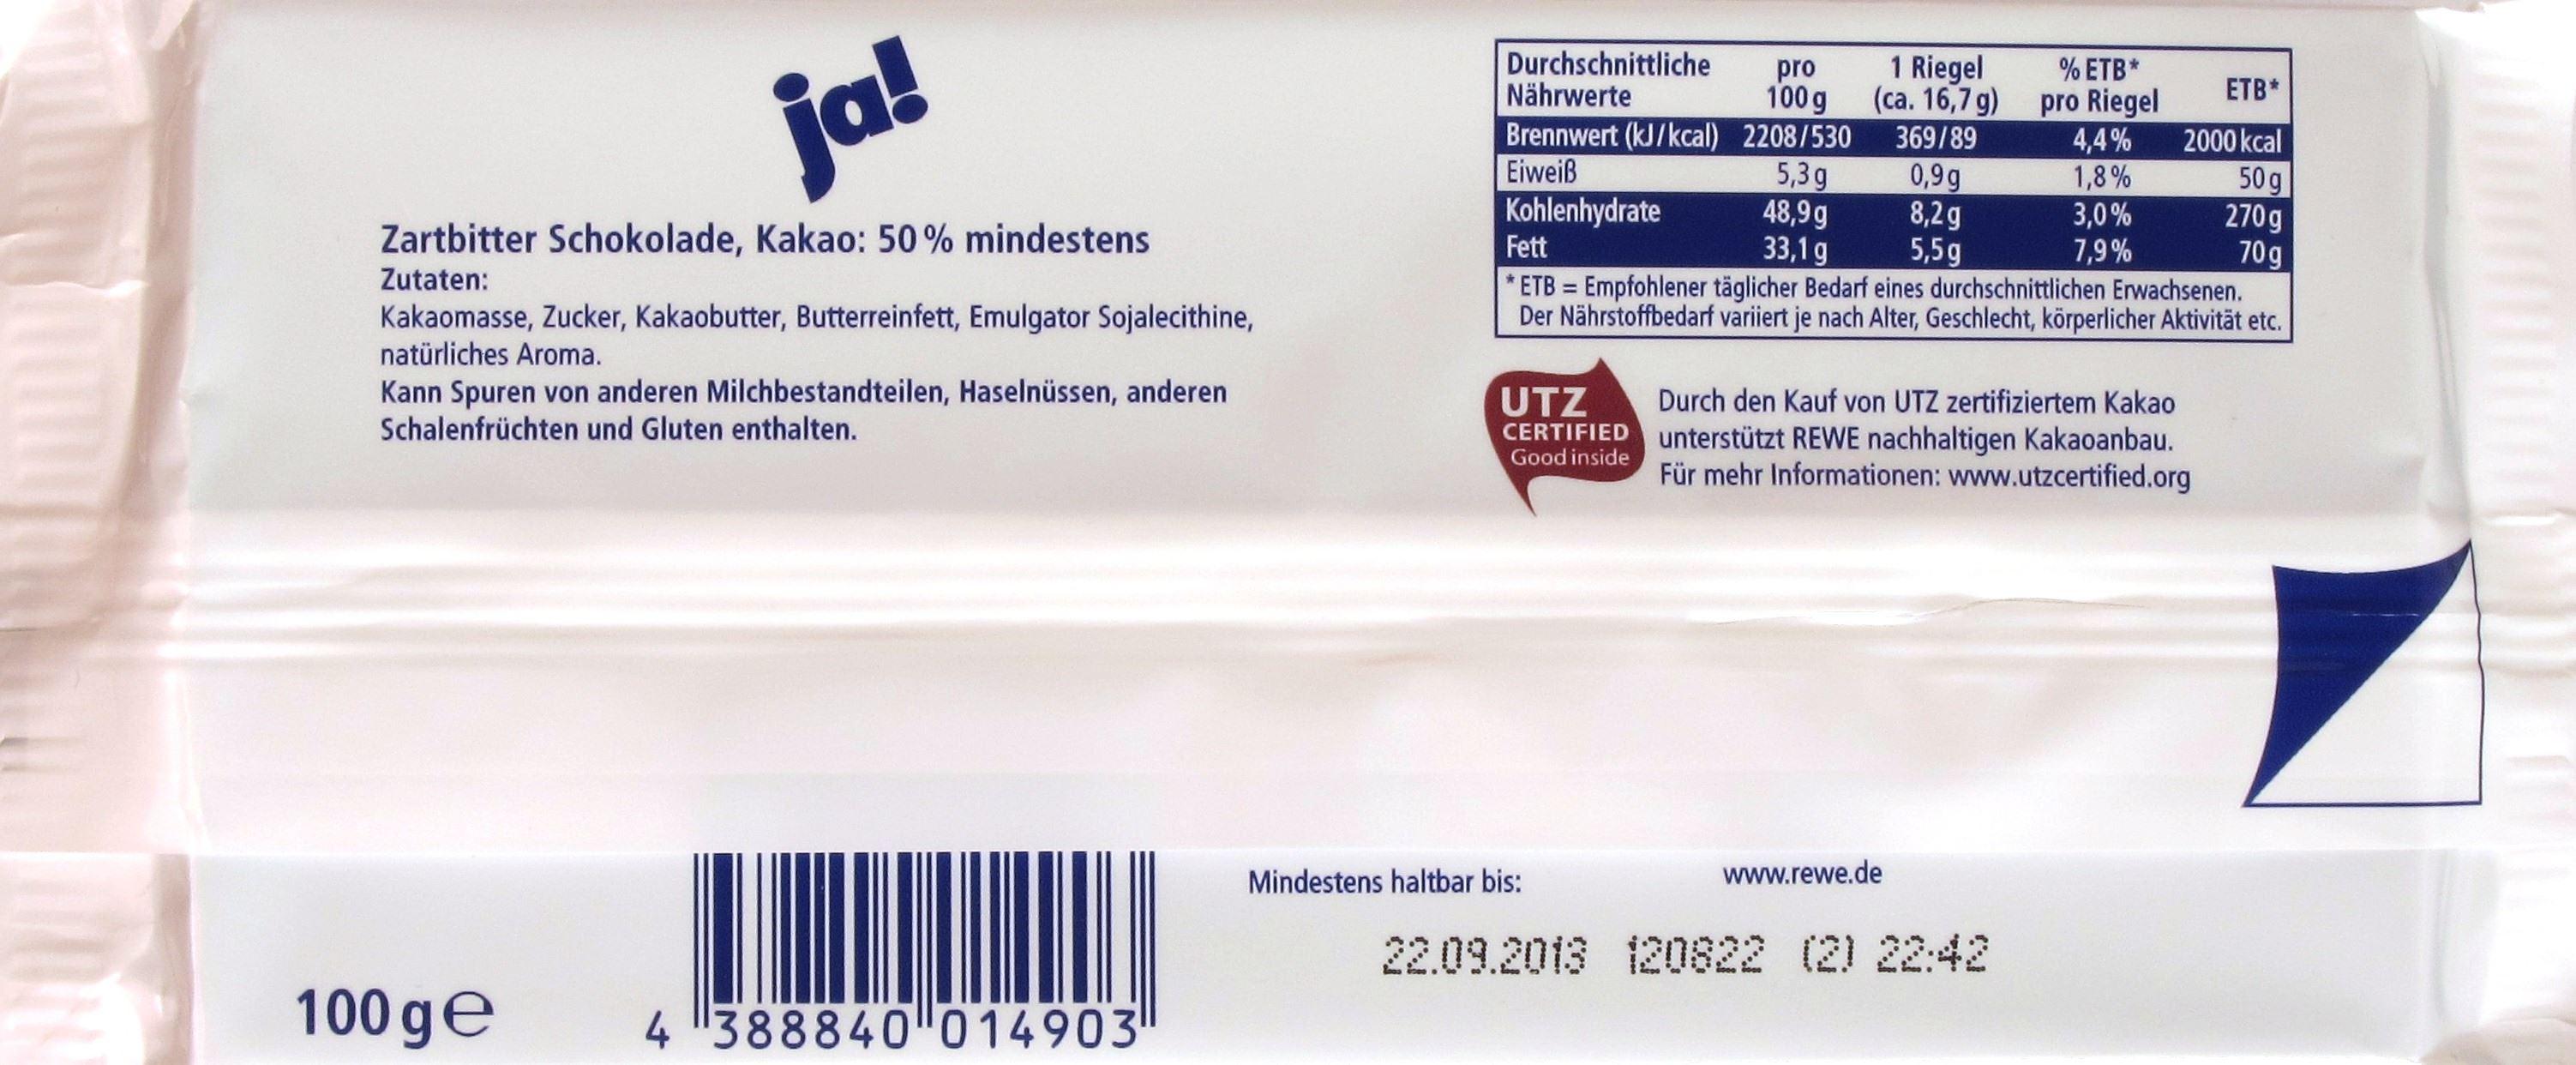 Ja! Zartbitter-Schokolade 50% - Inhaltsangaben